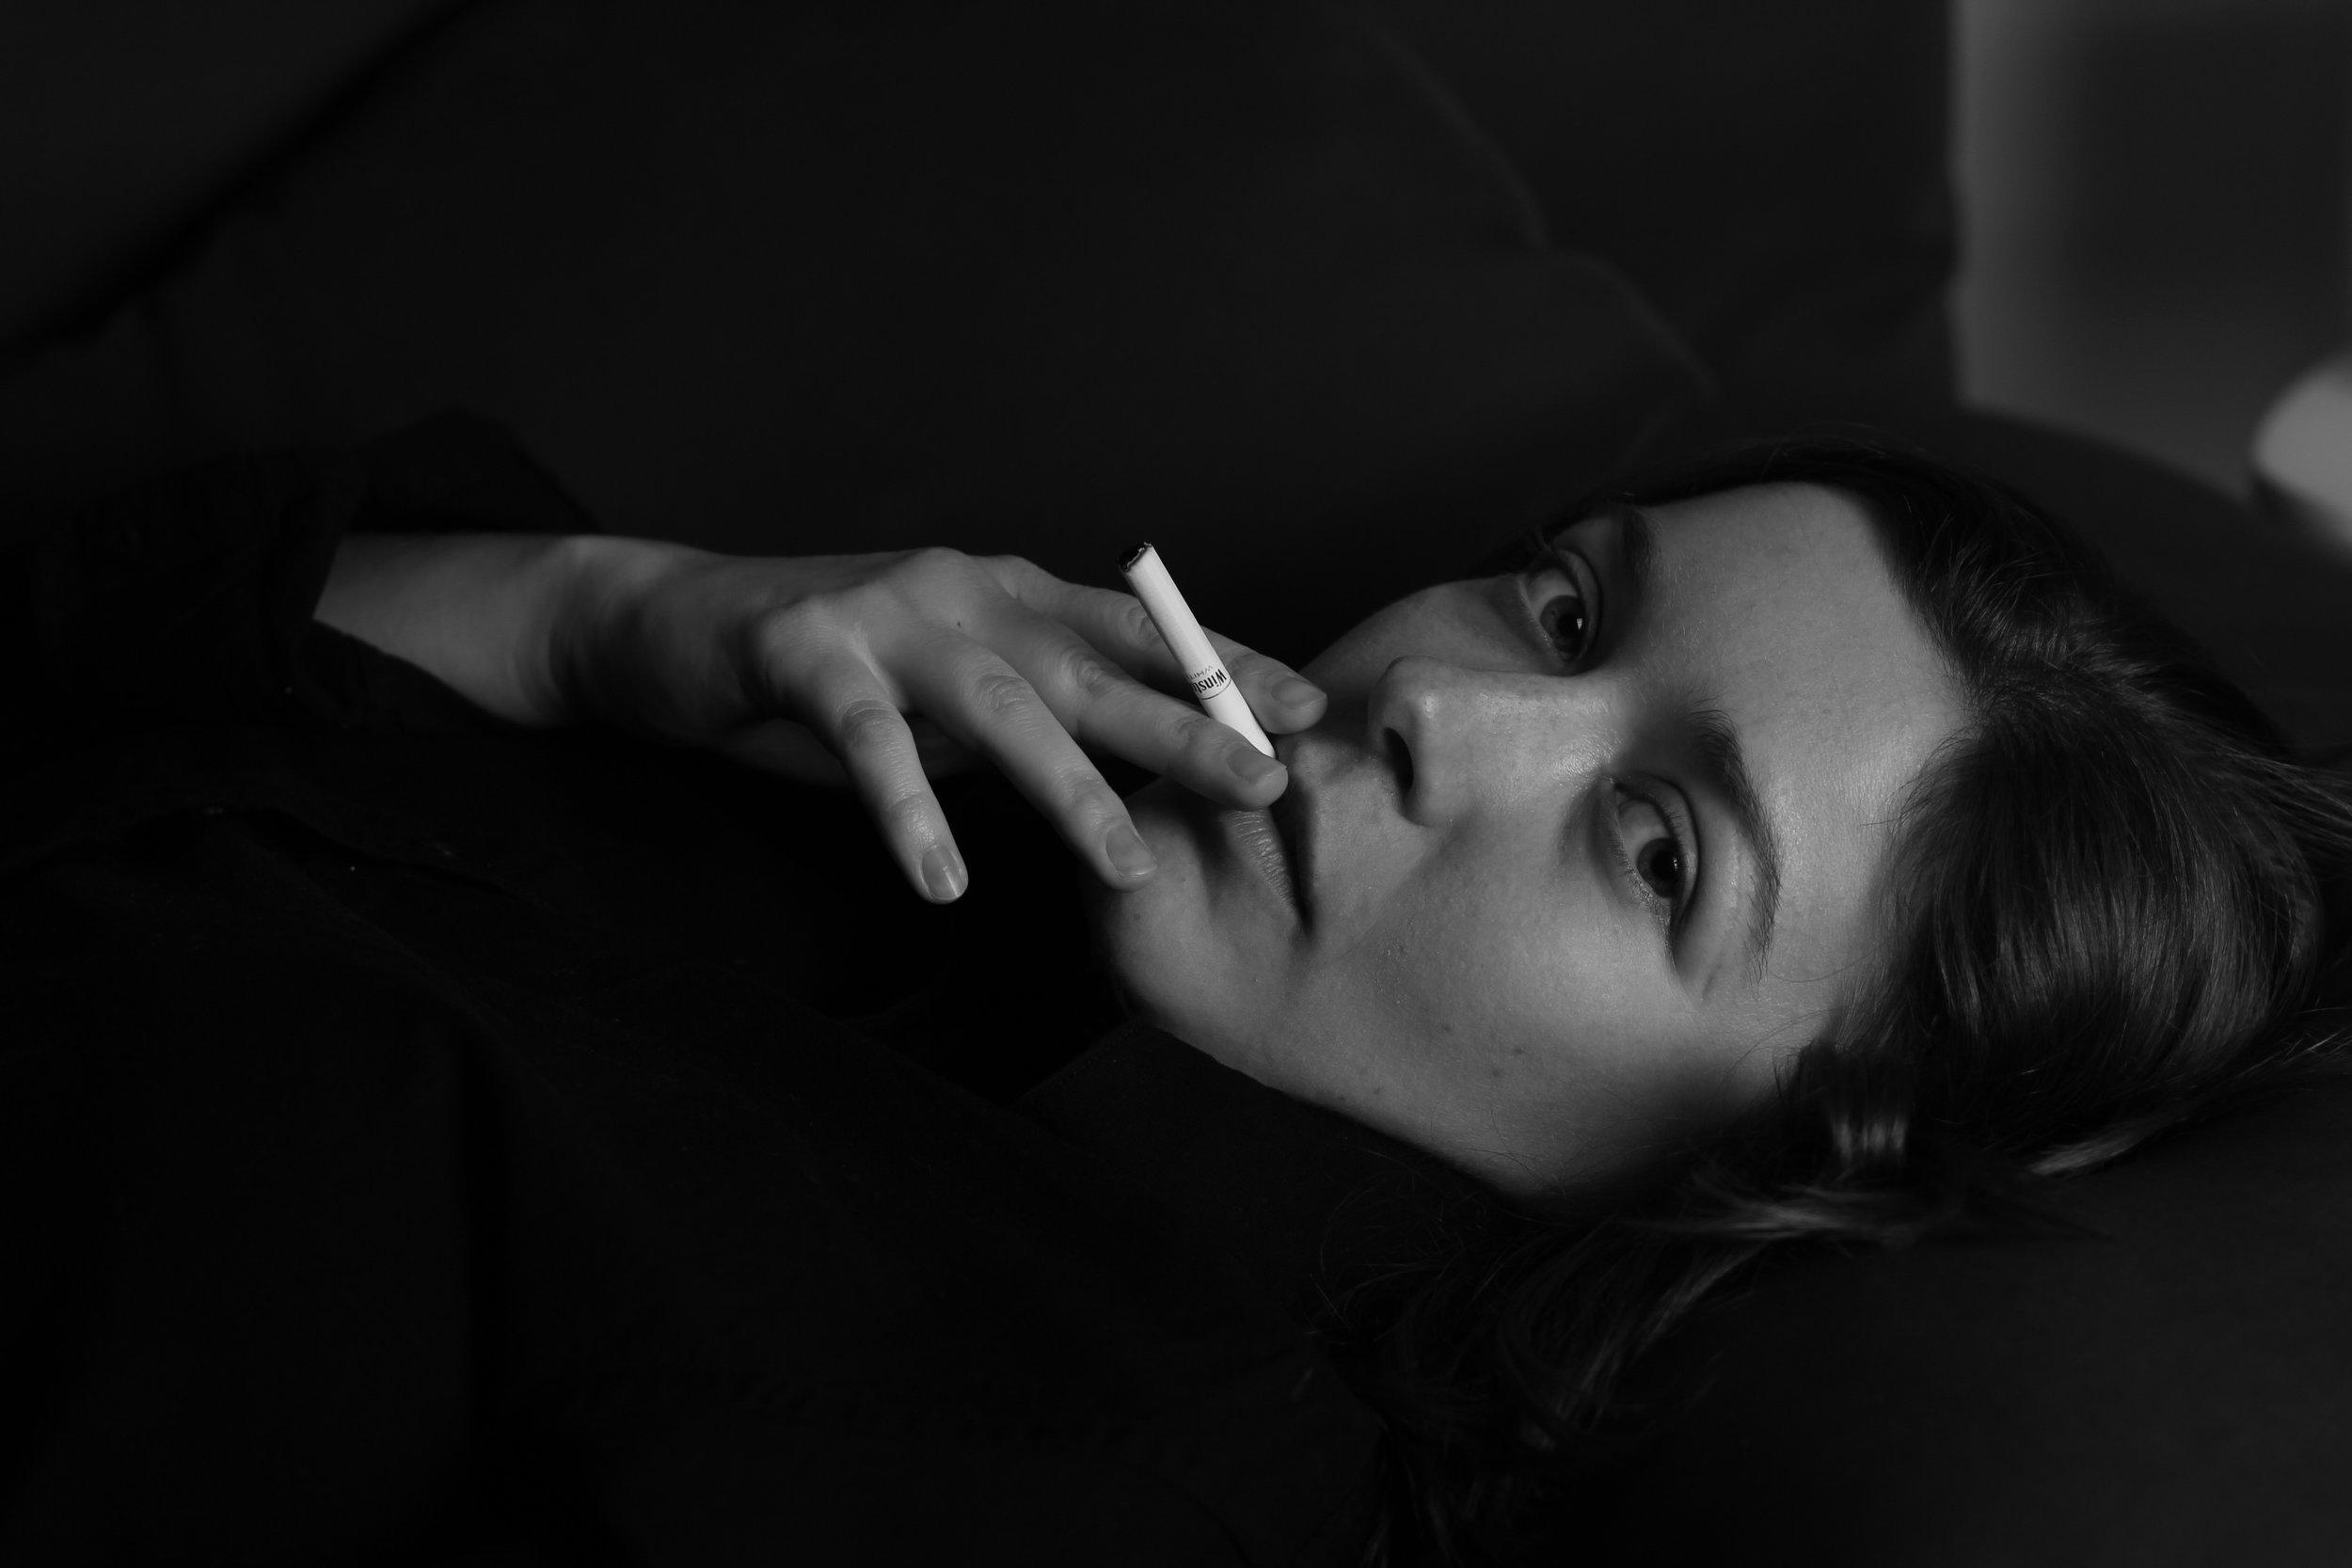 addiction-adult-black-and-white-301292.jpg